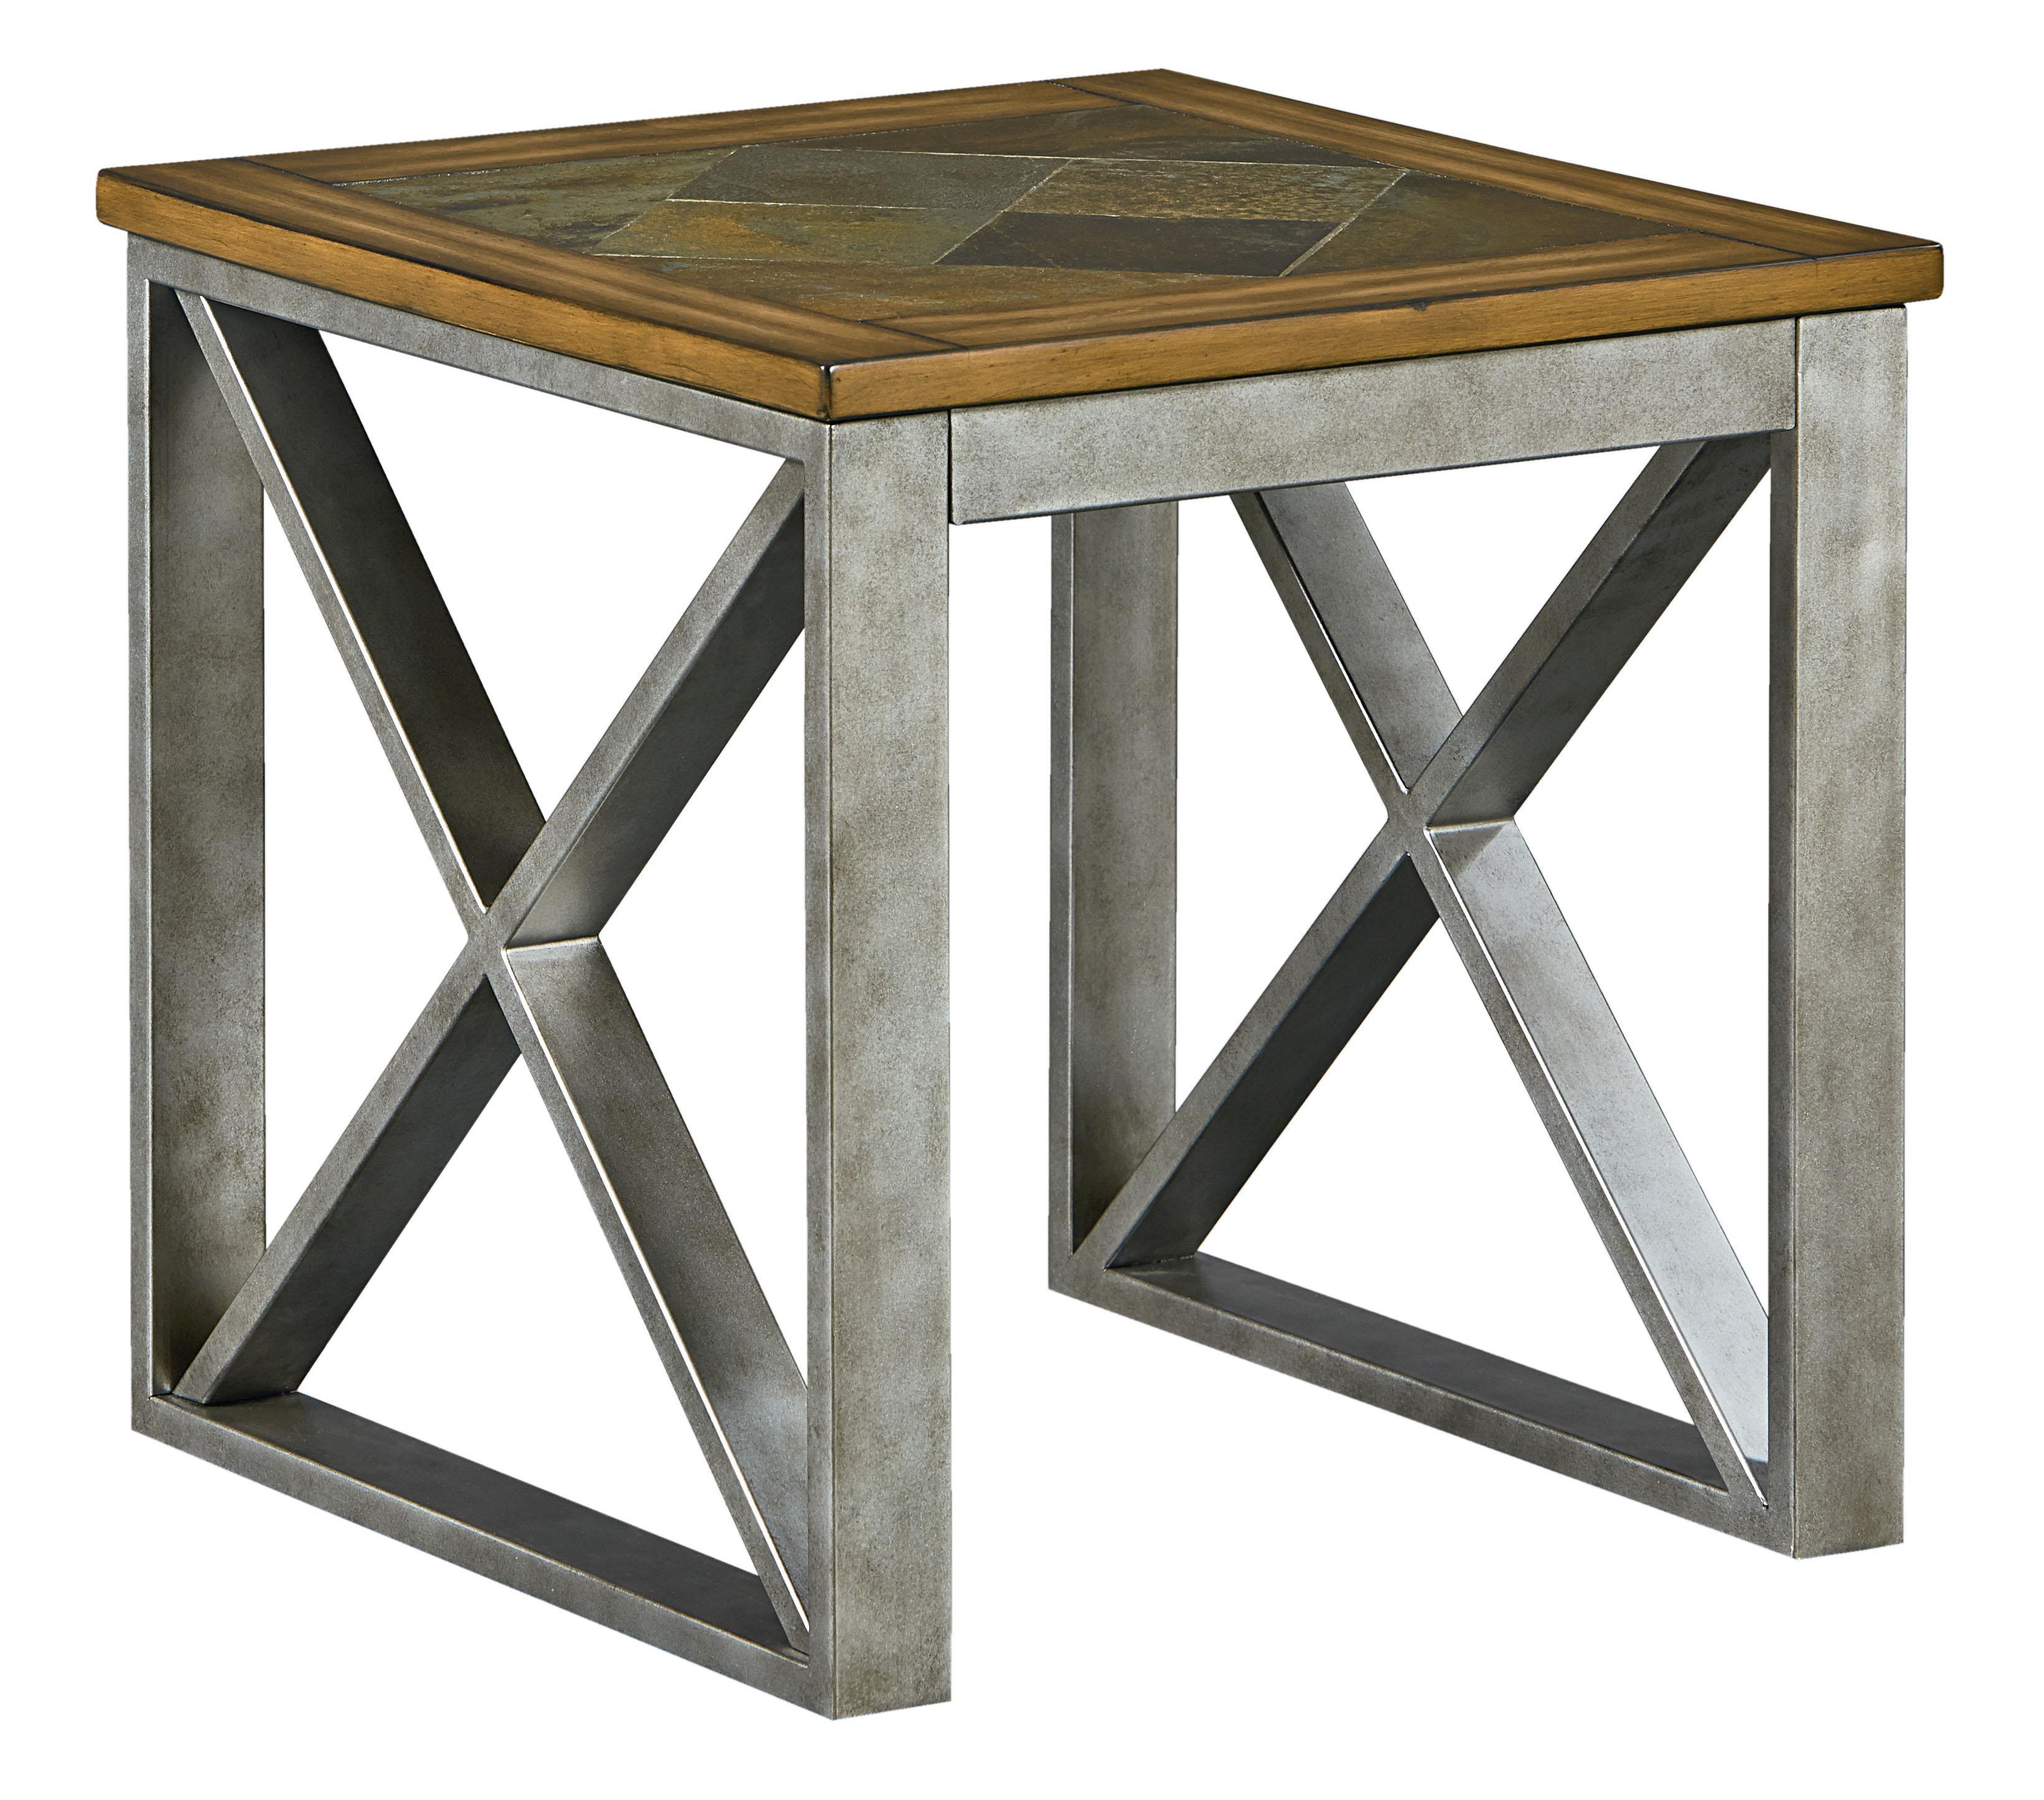 Standard Furniture Tessoro End Table    - Item Number: 28892